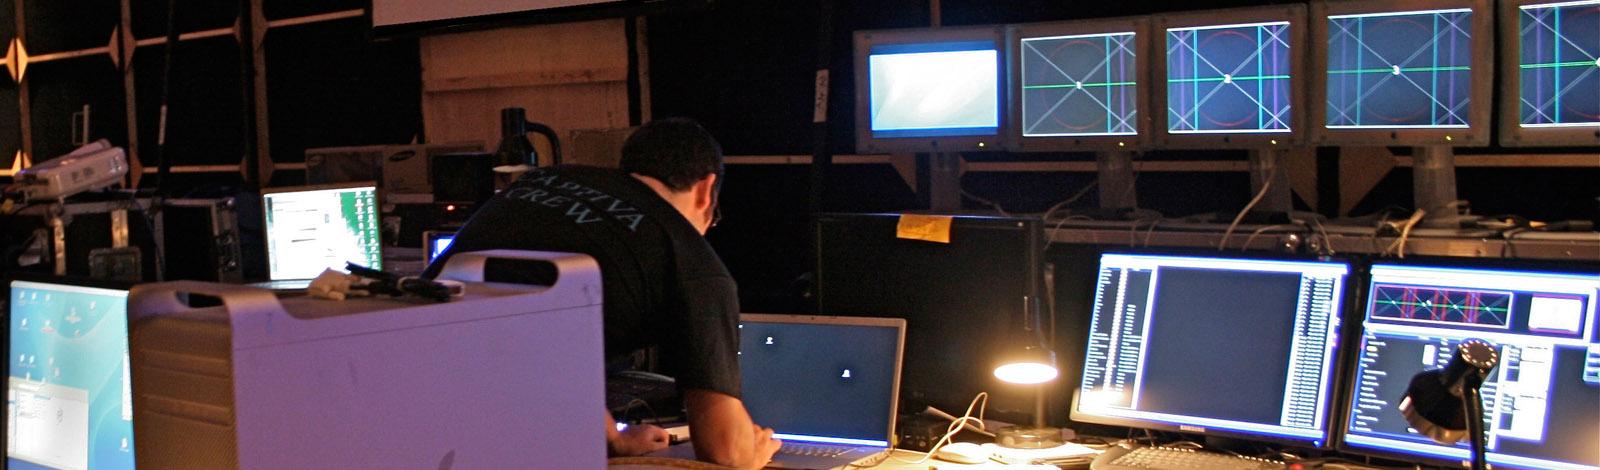 AV Hire, Set build, Rigging, Widescreen, Dataton Watchout